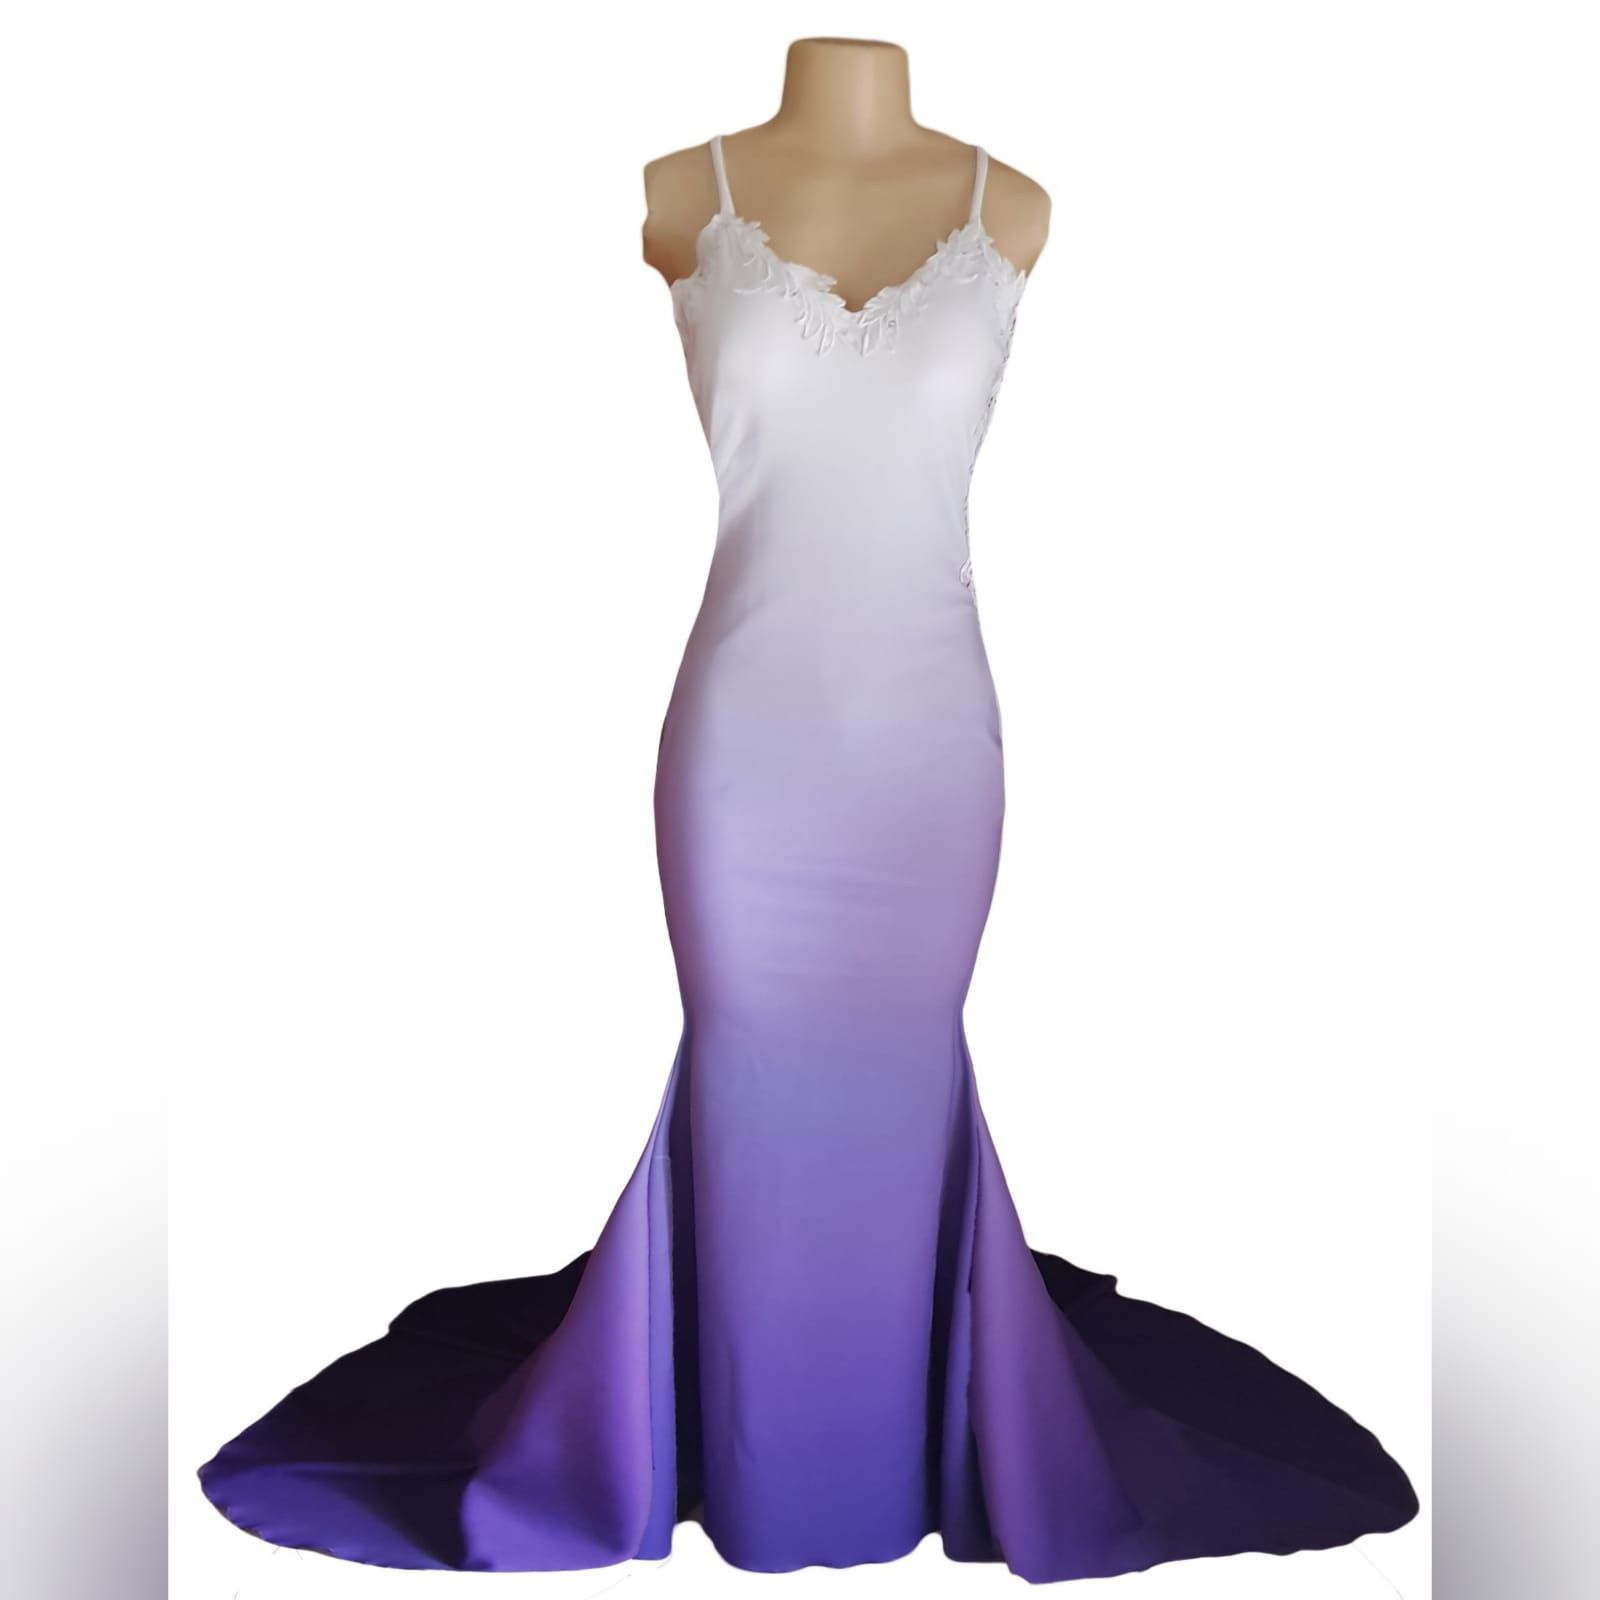 Vestido De Finalistas Ombre Branco E Roxo Prom Dresses Mermaid Prom Dresses Dresses [ 1600 x 1600 Pixel ]